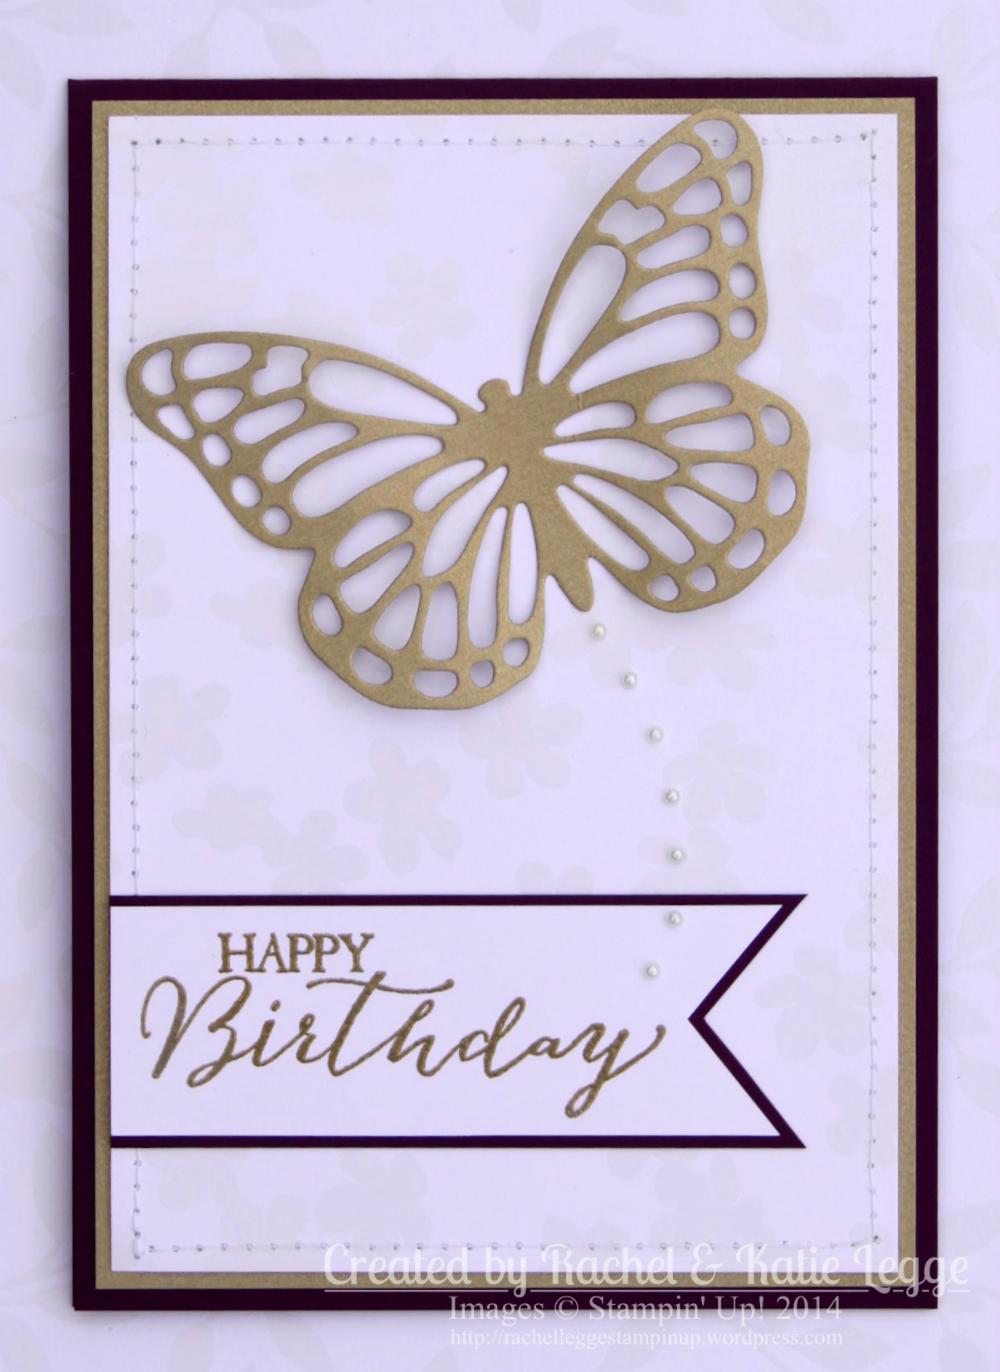 birthday card  rachel legge  independent stampin' up demonstrator, Birthday card